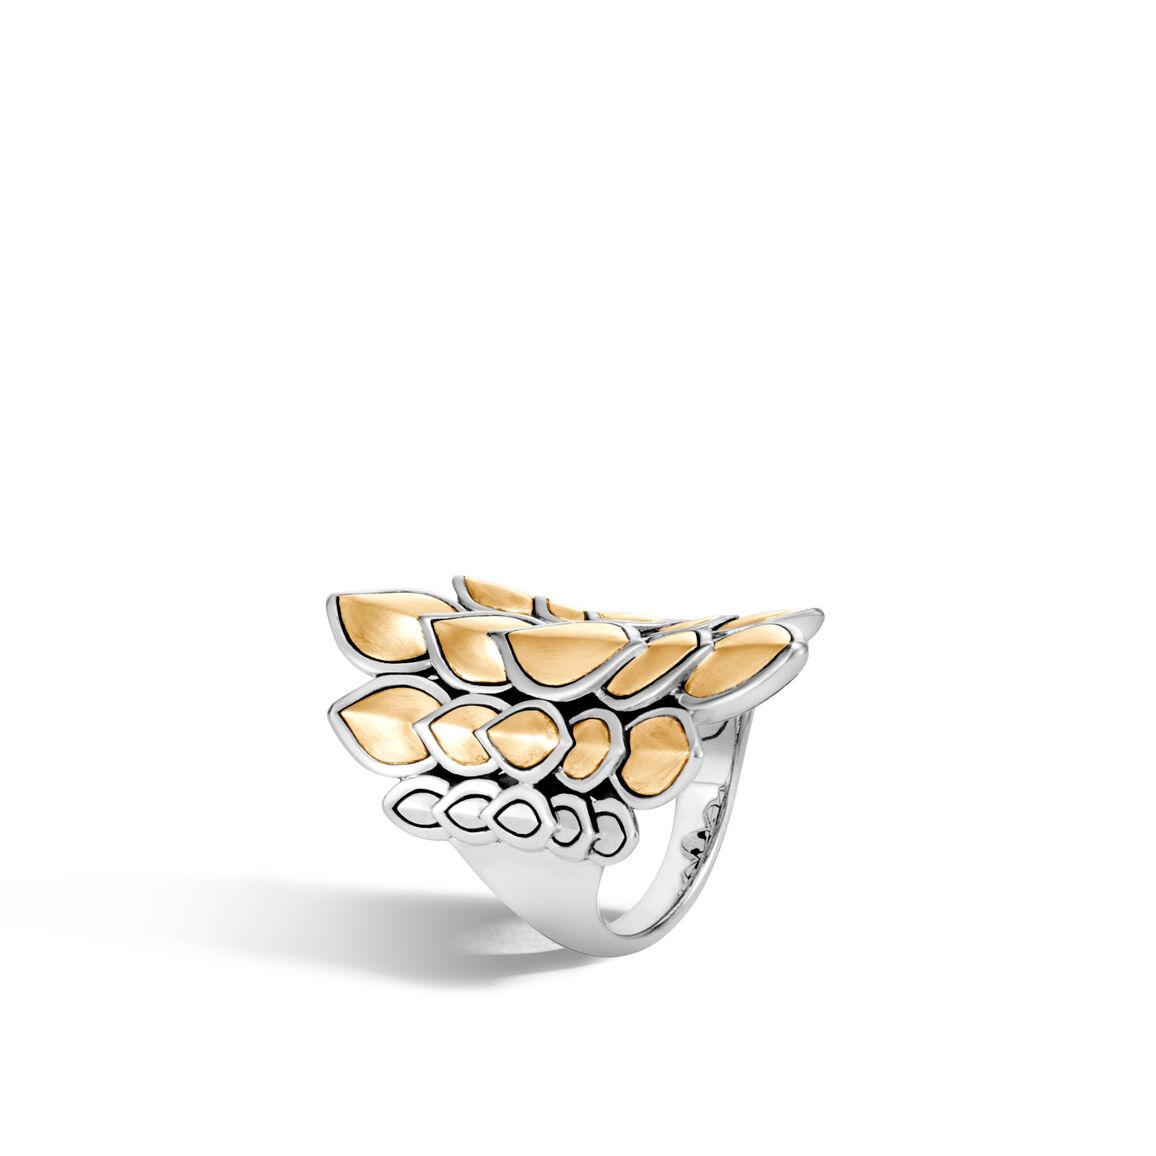 Legends Naga Saddle Ring in Silver and Brushed 18K Gold